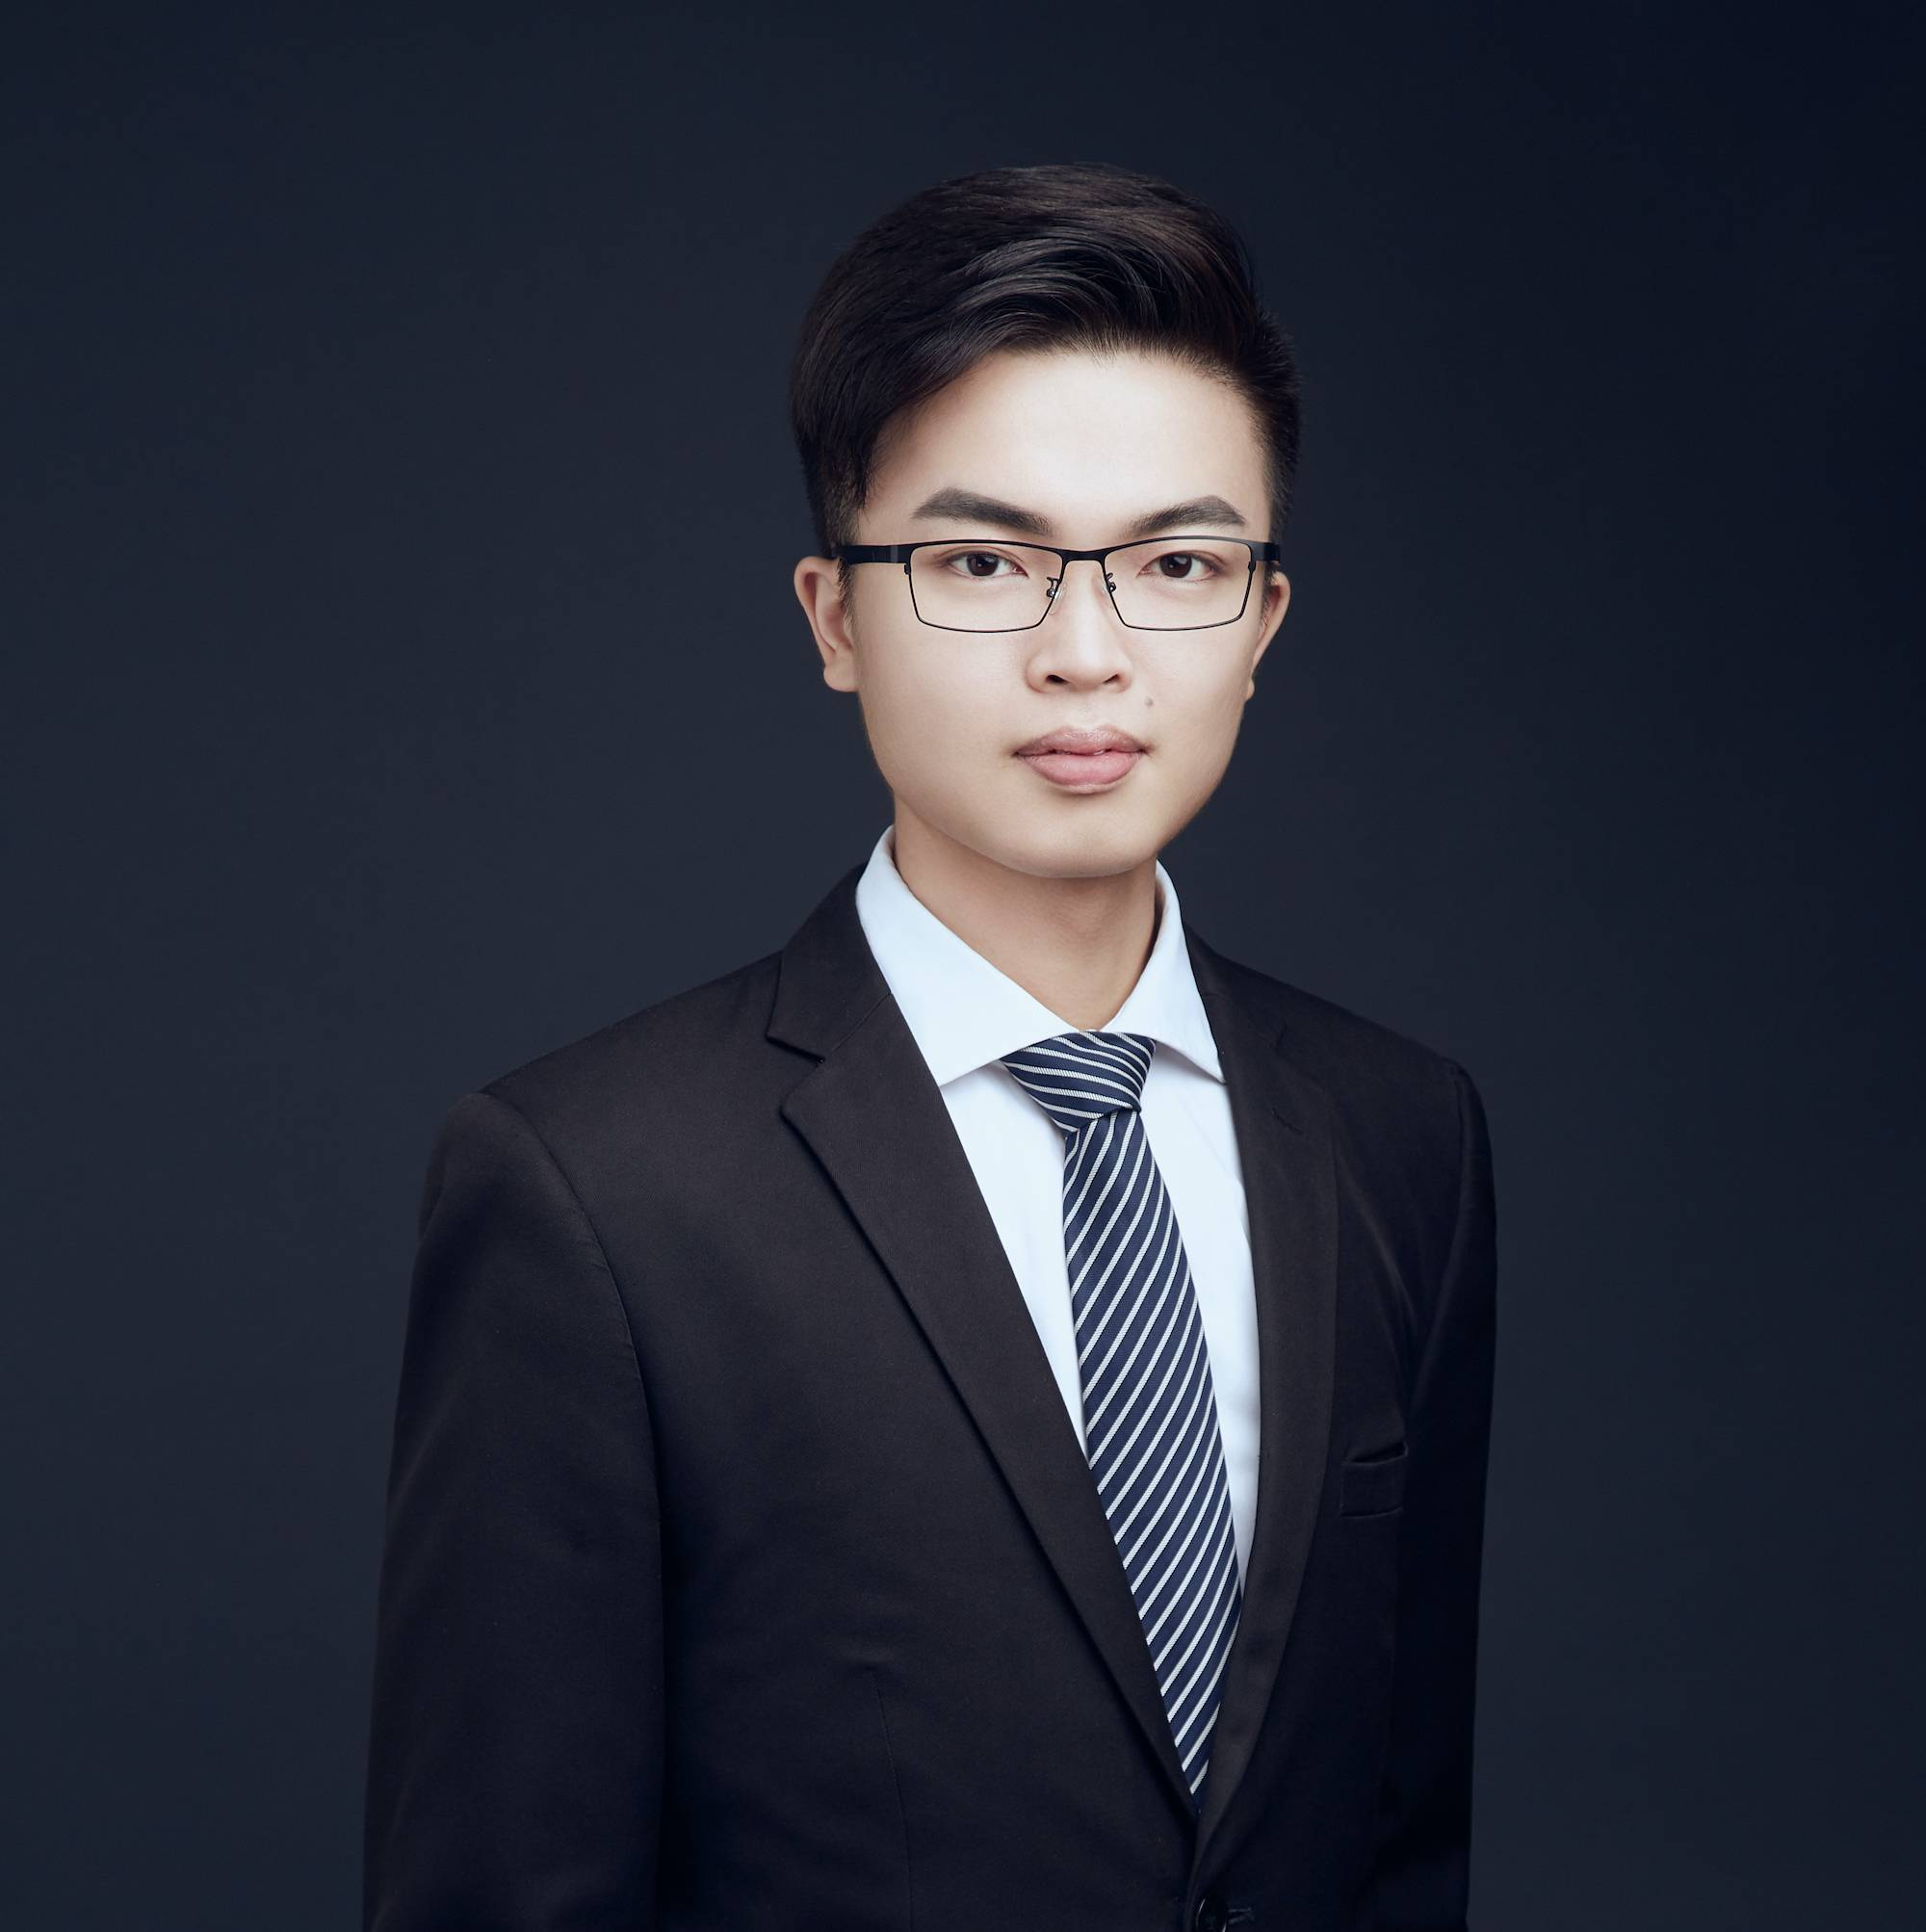 XLNet 第一作者杨植麟:为什么预处理模型XLNet比BERT、RoBERTa更加优越